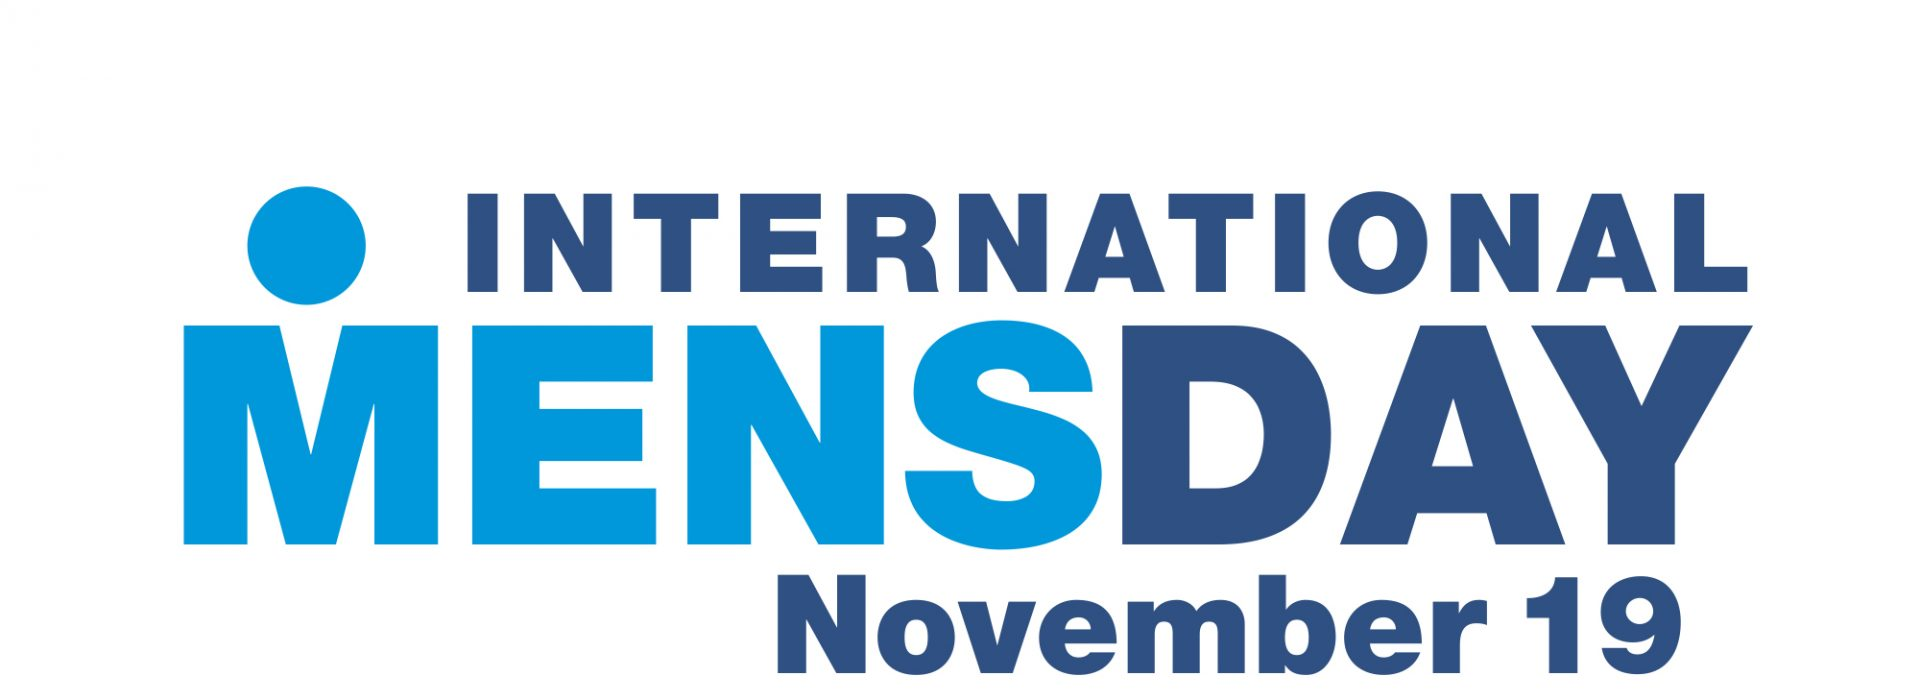 International Mens Day logo